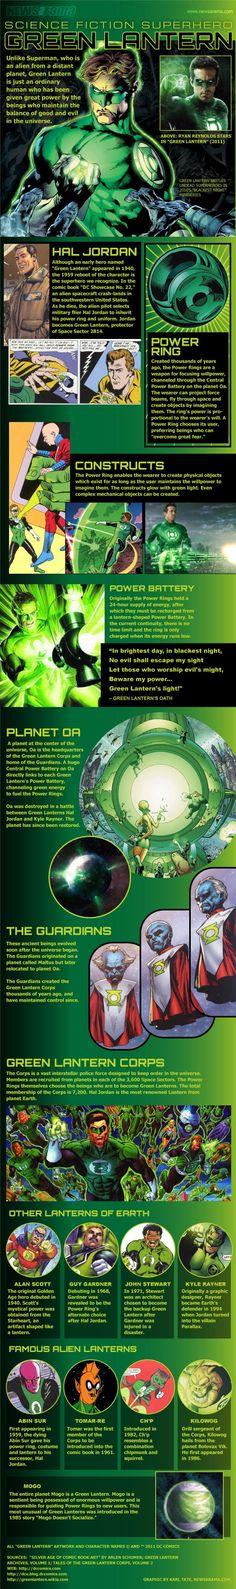 Green Lantern via : 20 Super Infographics About Superheroes | Visual.ly Blog